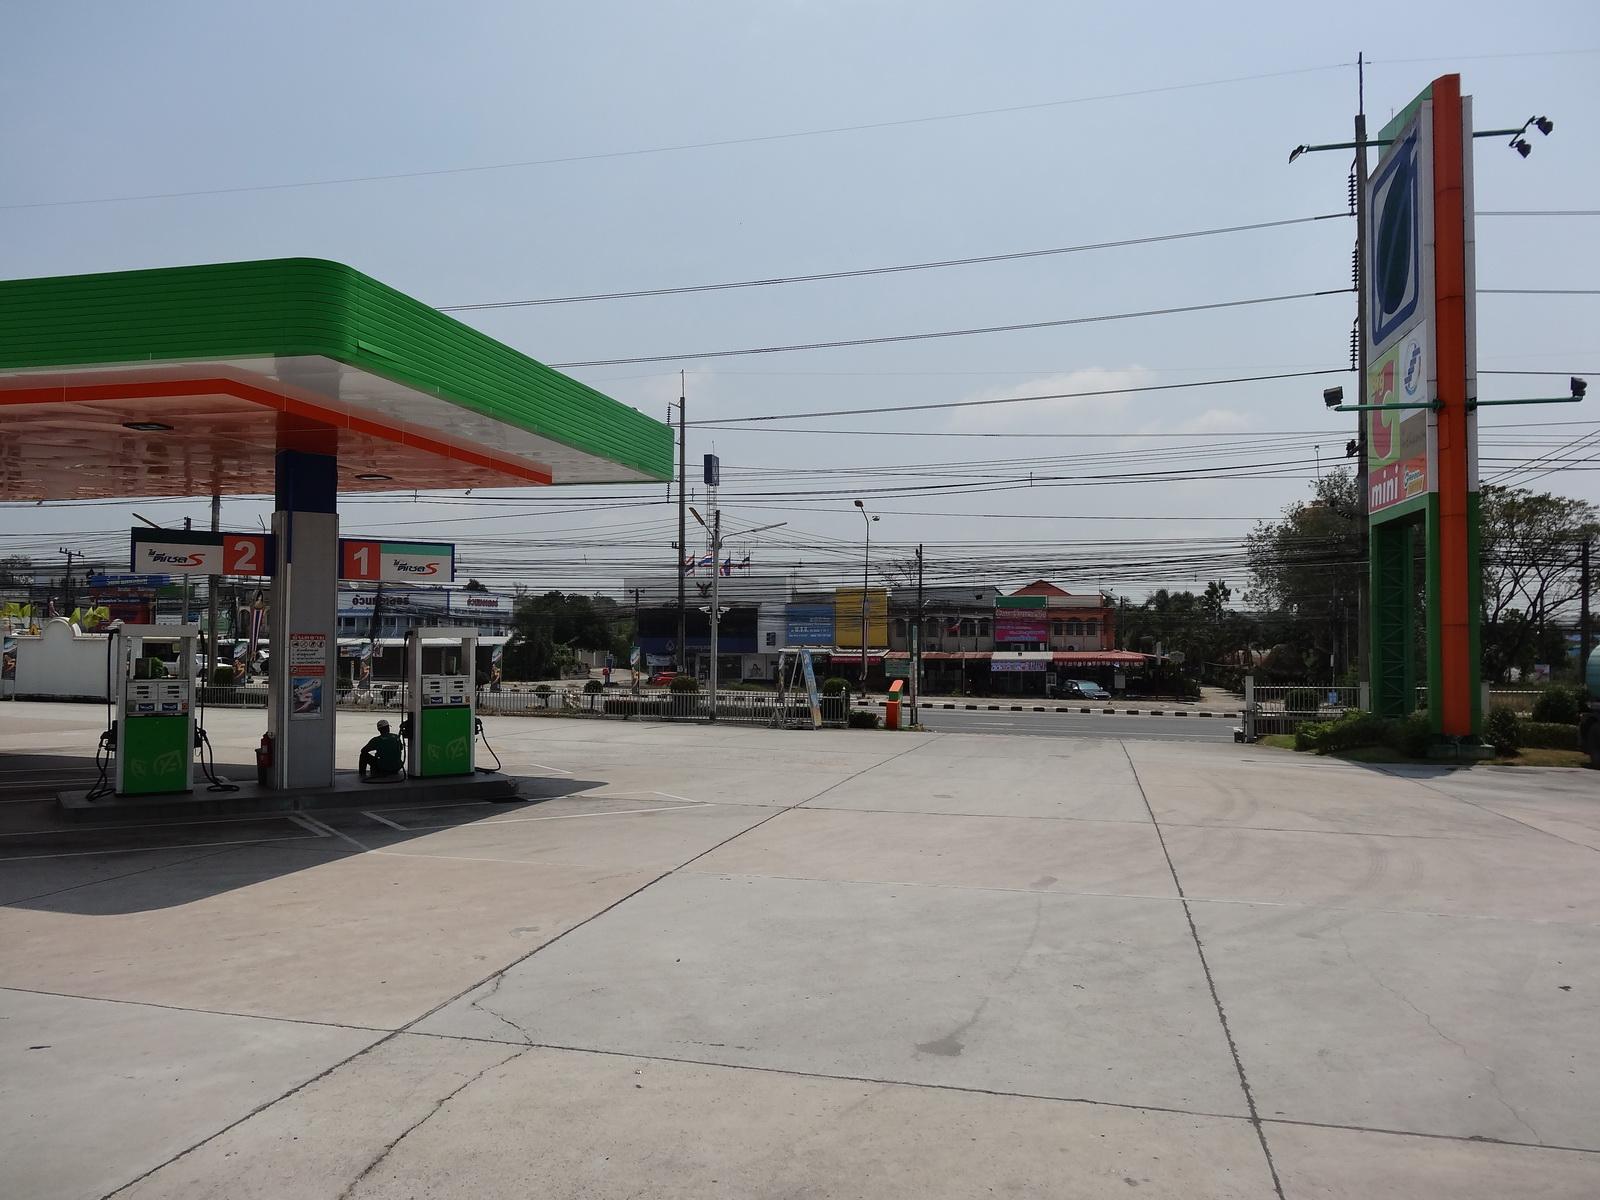 01 Pattaya 055